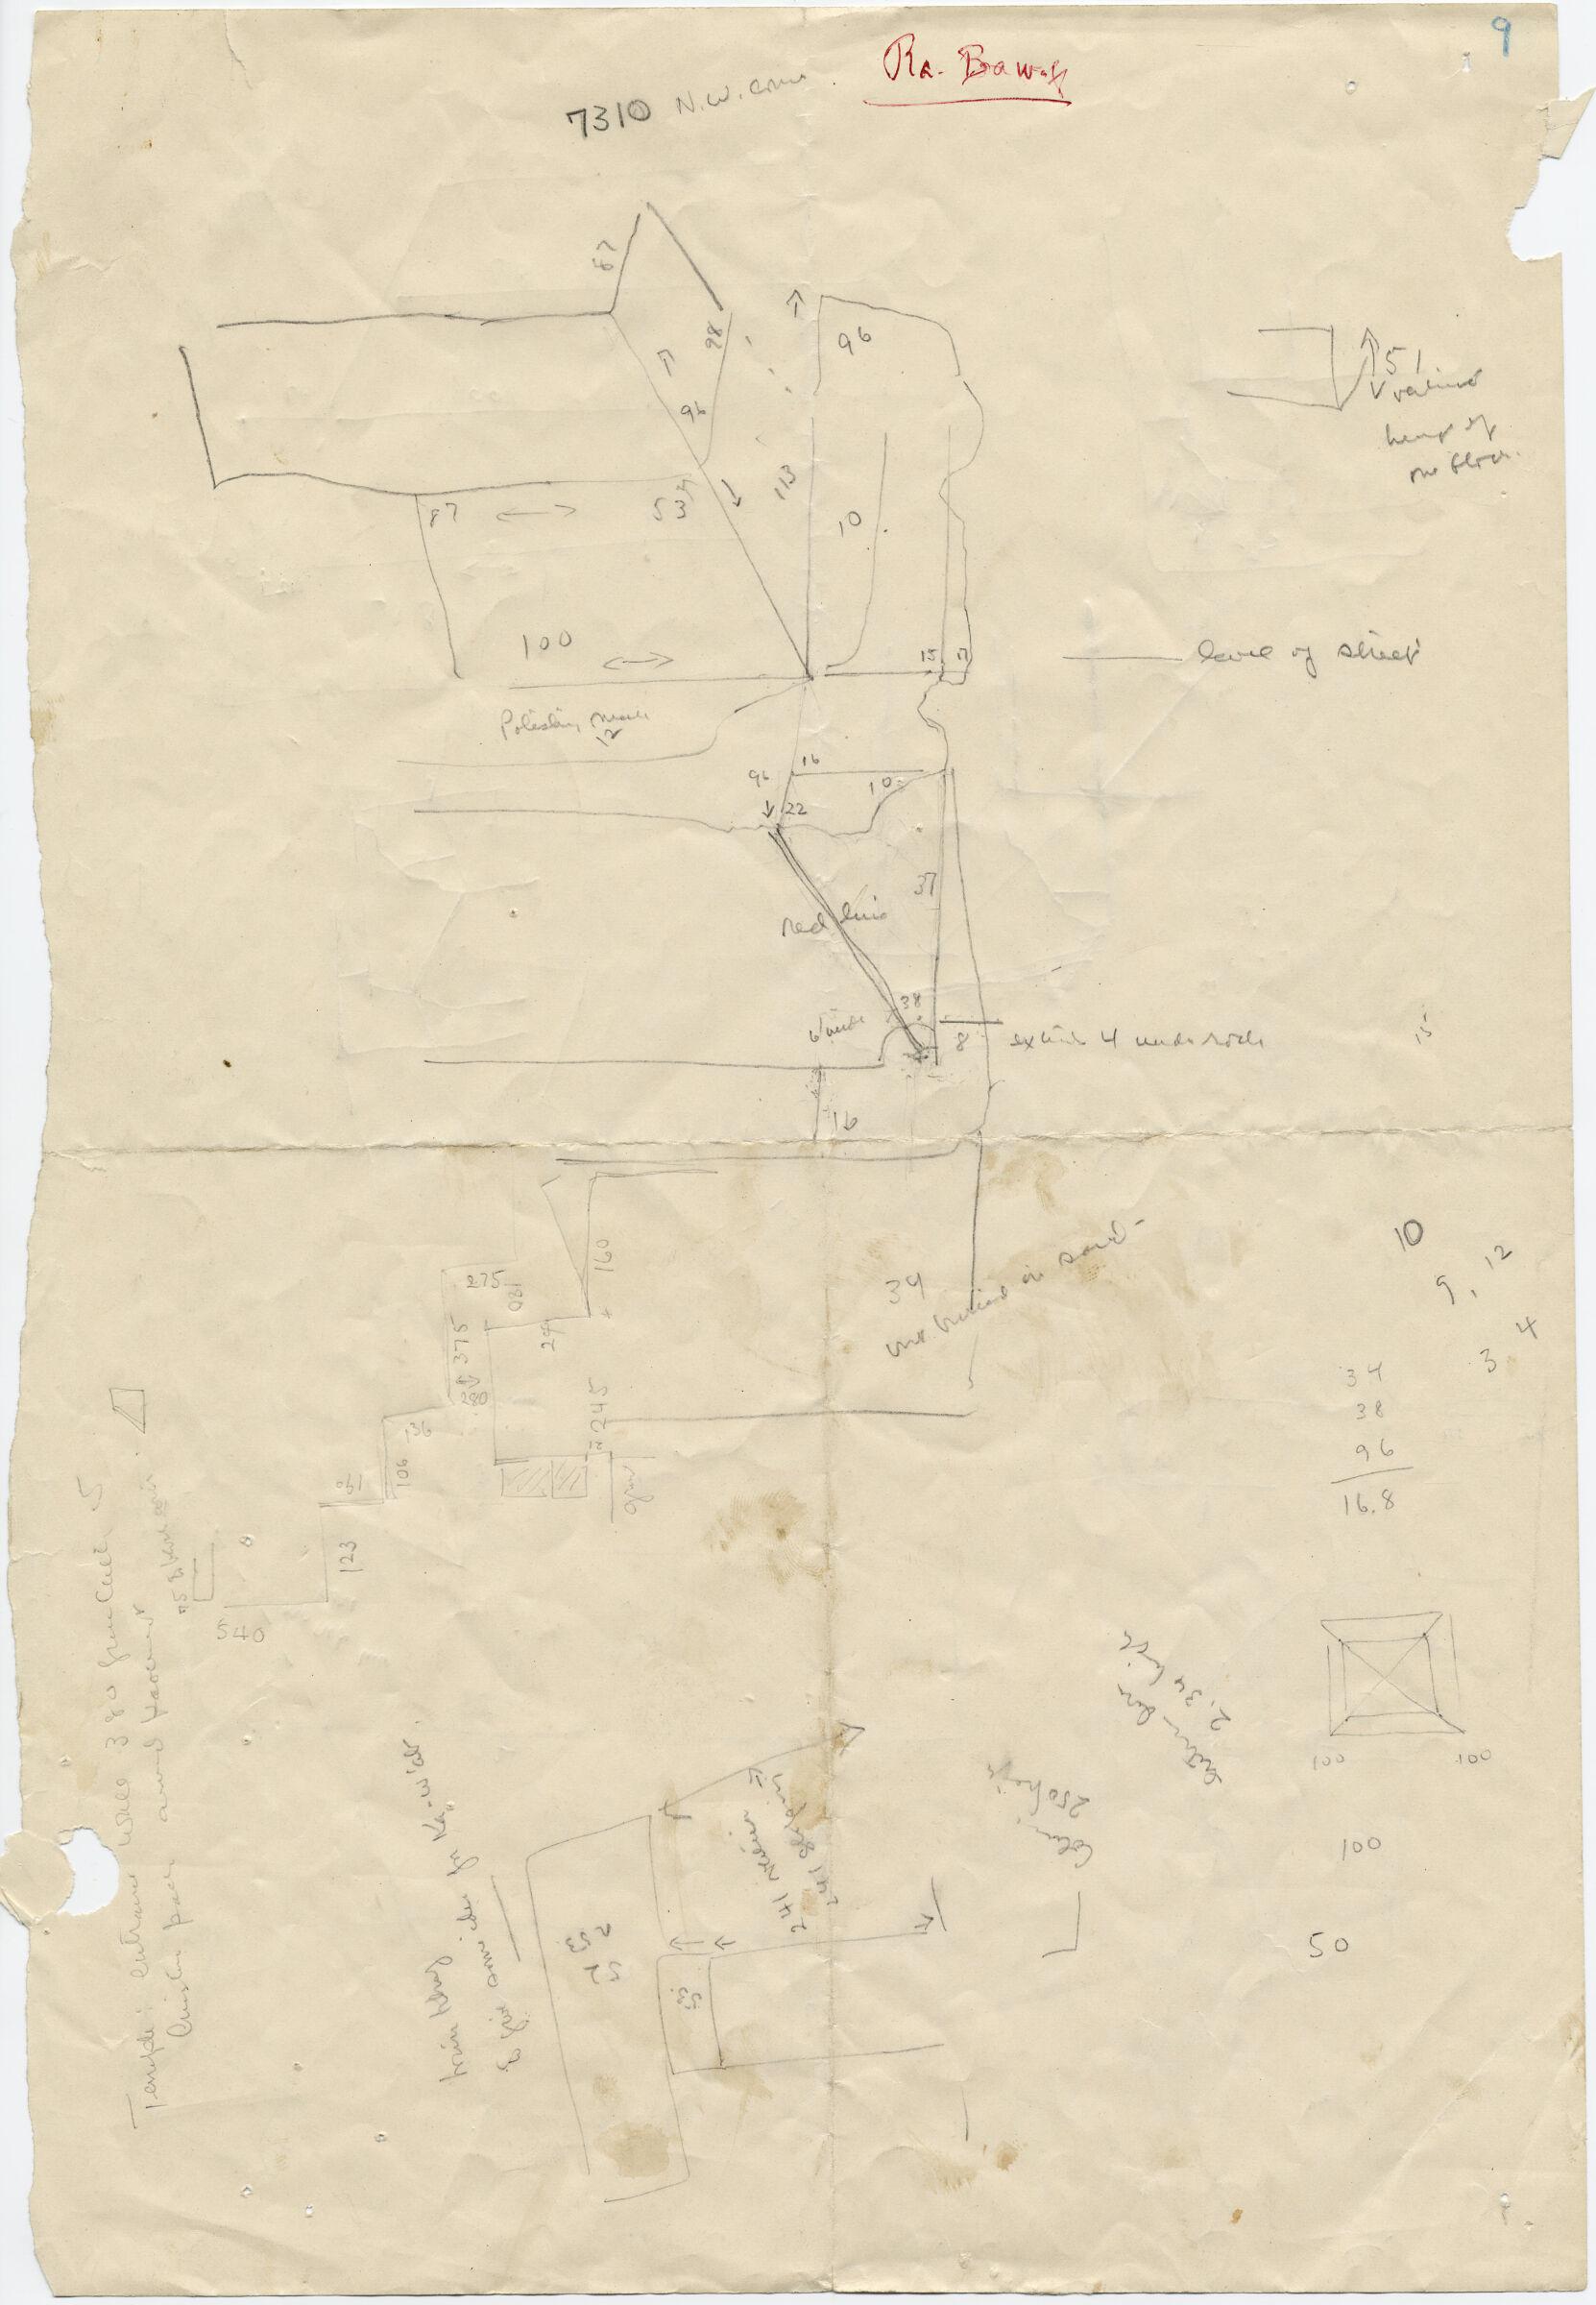 Drawings: G 7310-7320: G 731, Sketch plan of NW corner